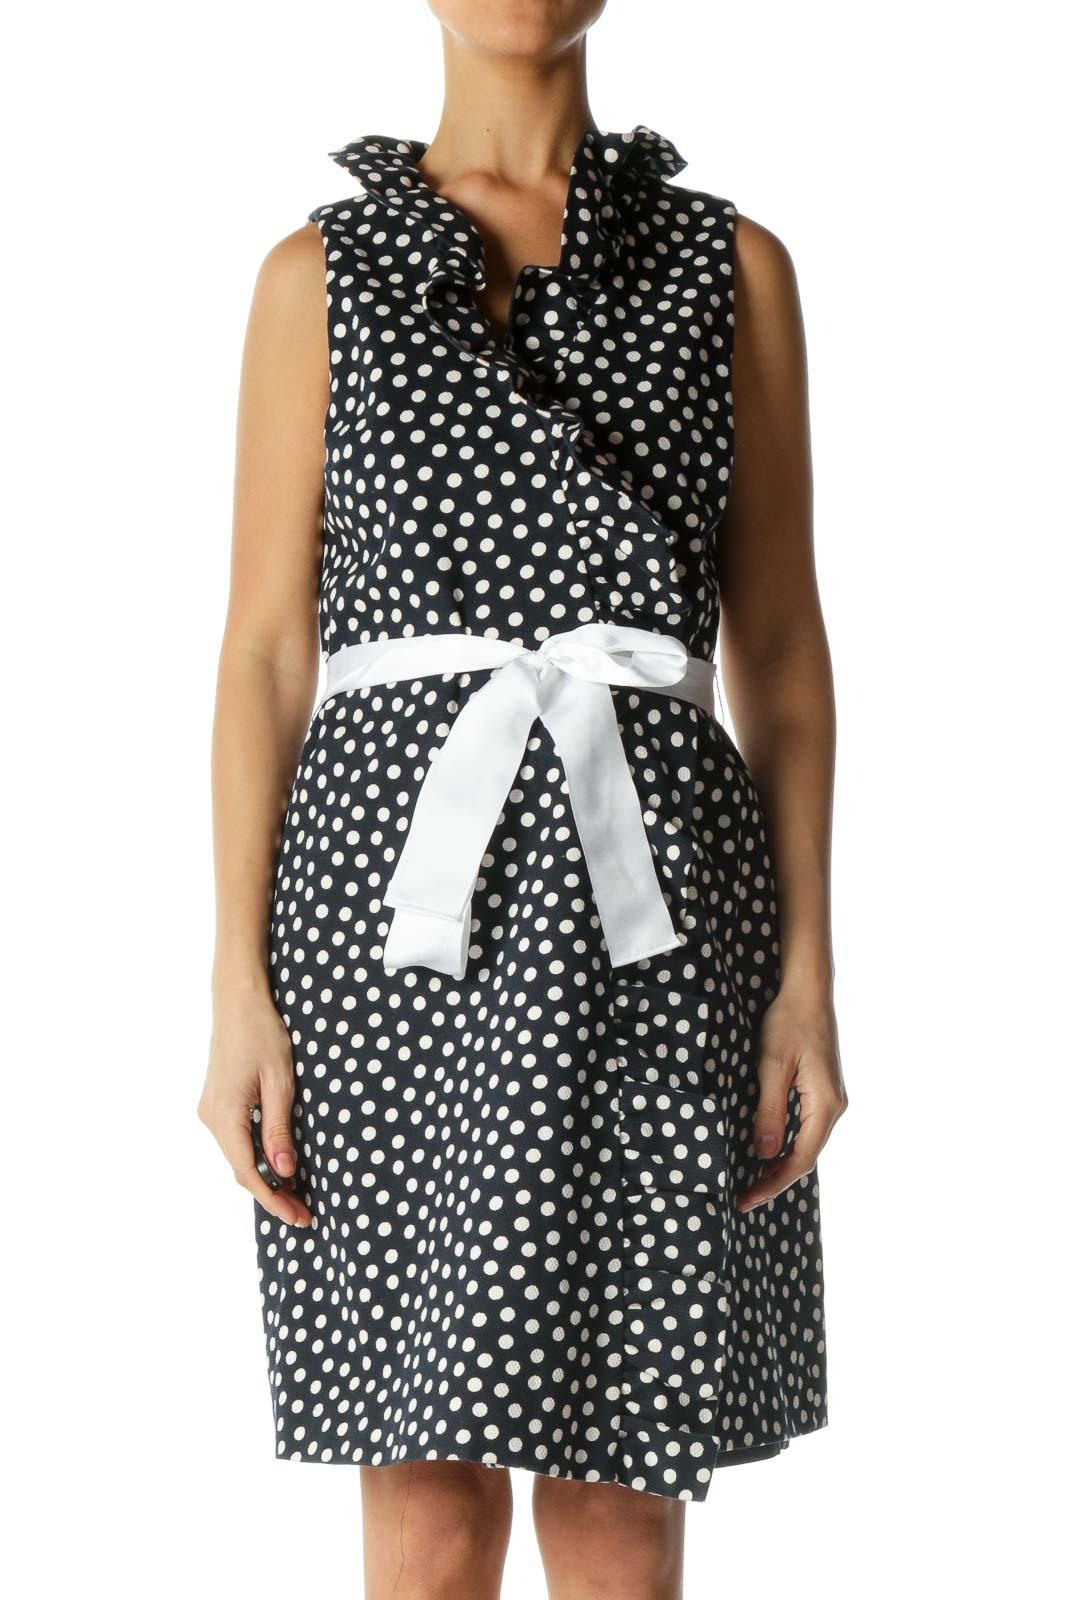 Blue and White Polka-Dot Dress Front